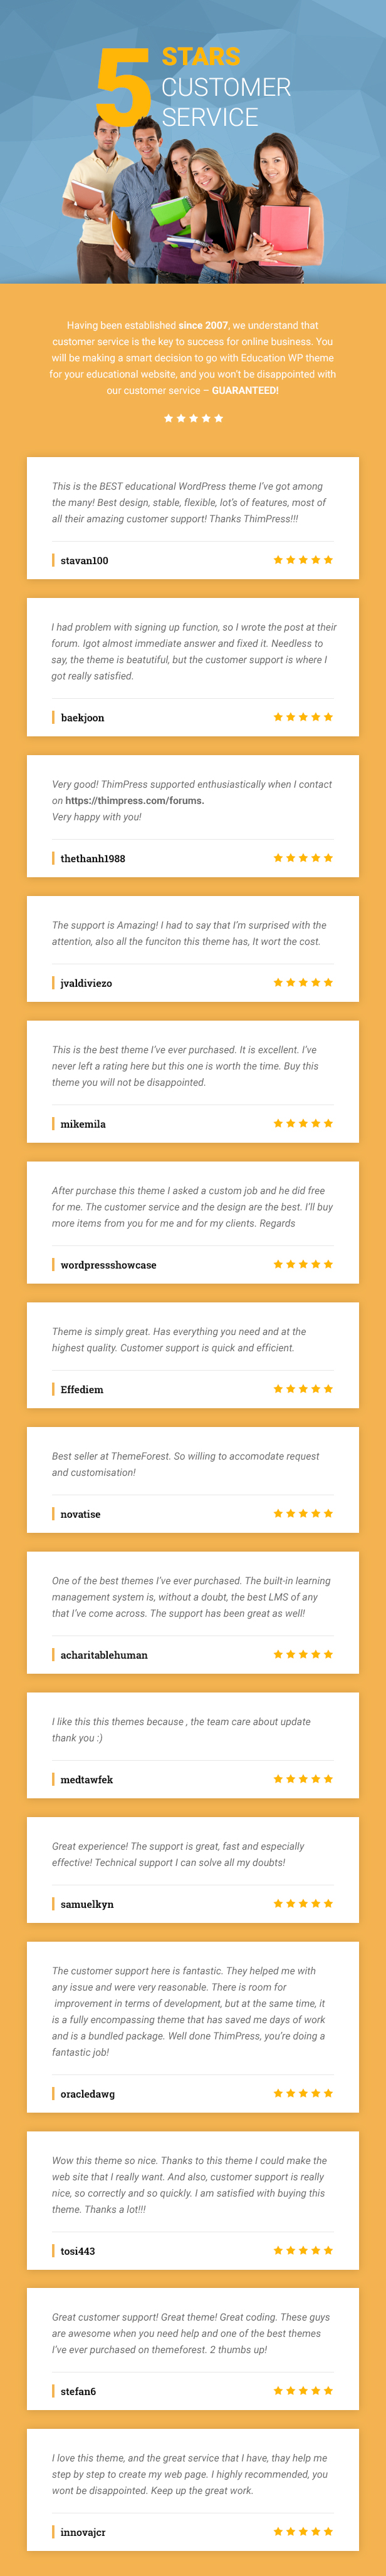 Education WordPress theme 5 stars customers - Education WordPress Theme | Eduma